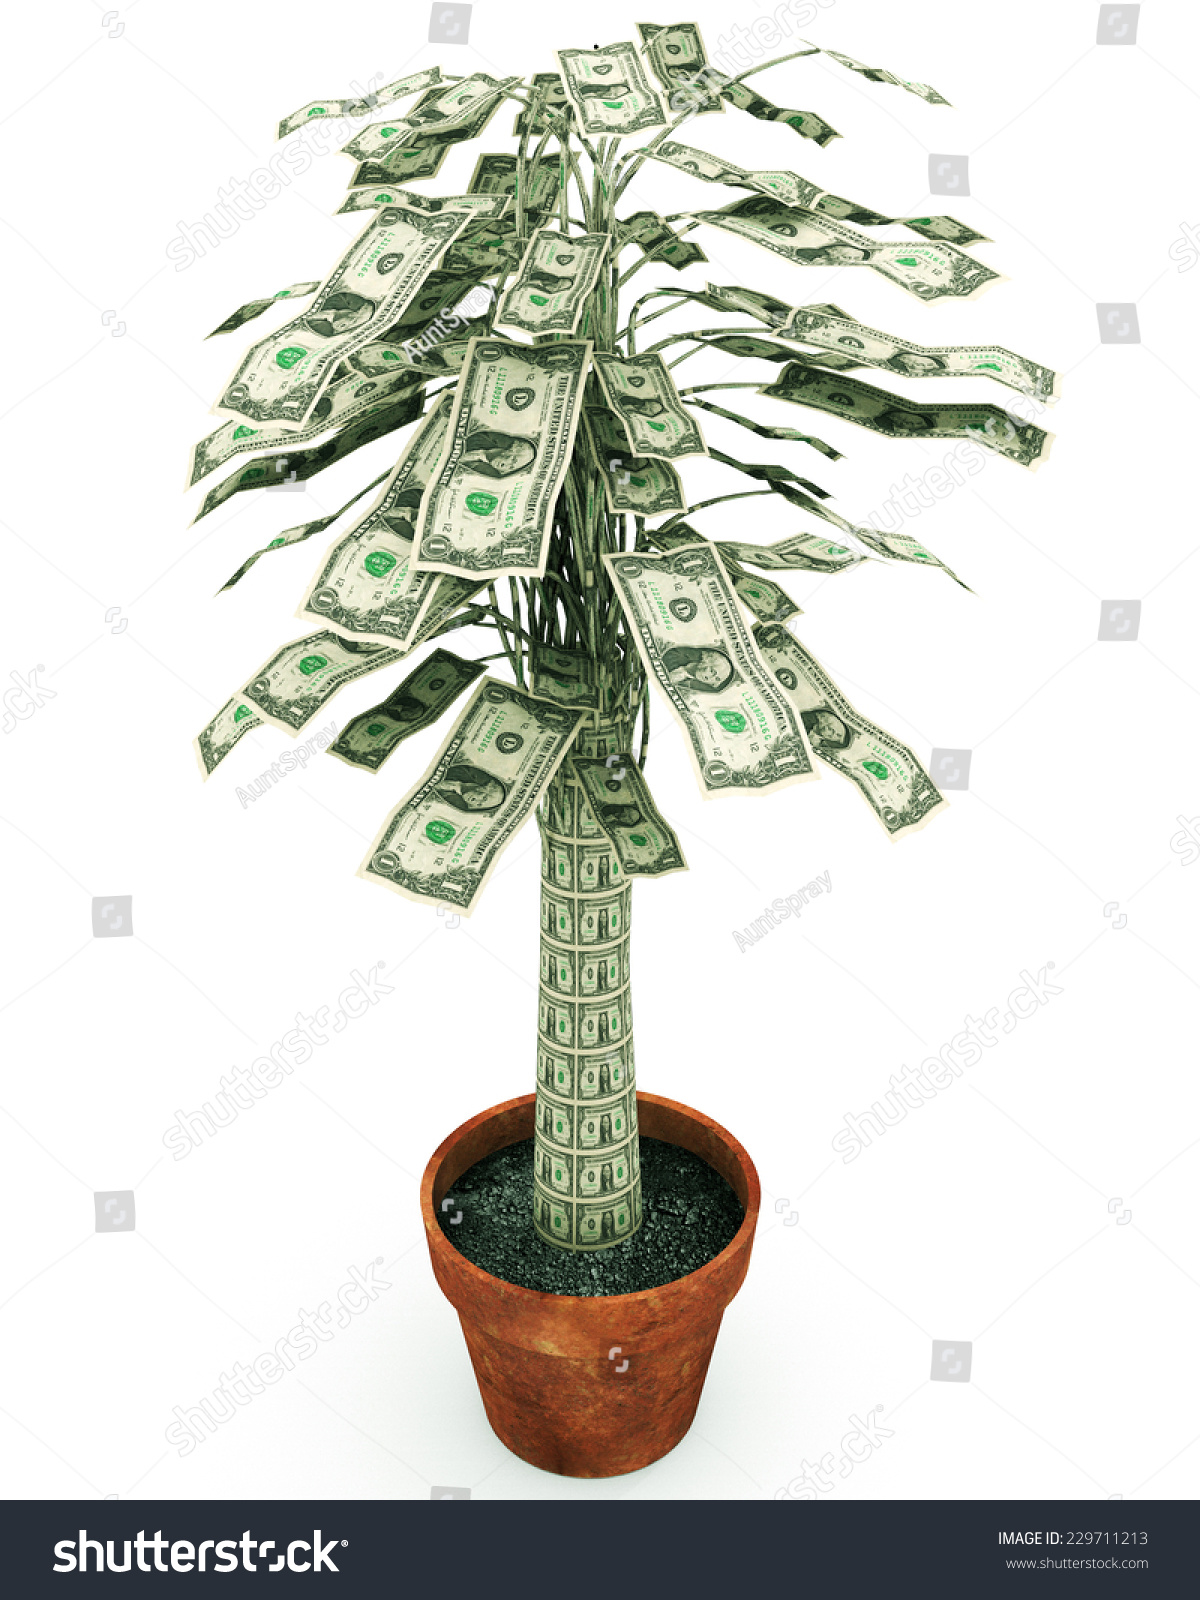 Money Tree Illustration Related Growing Wealth Stock Illustration 229711213 - Shutterstock